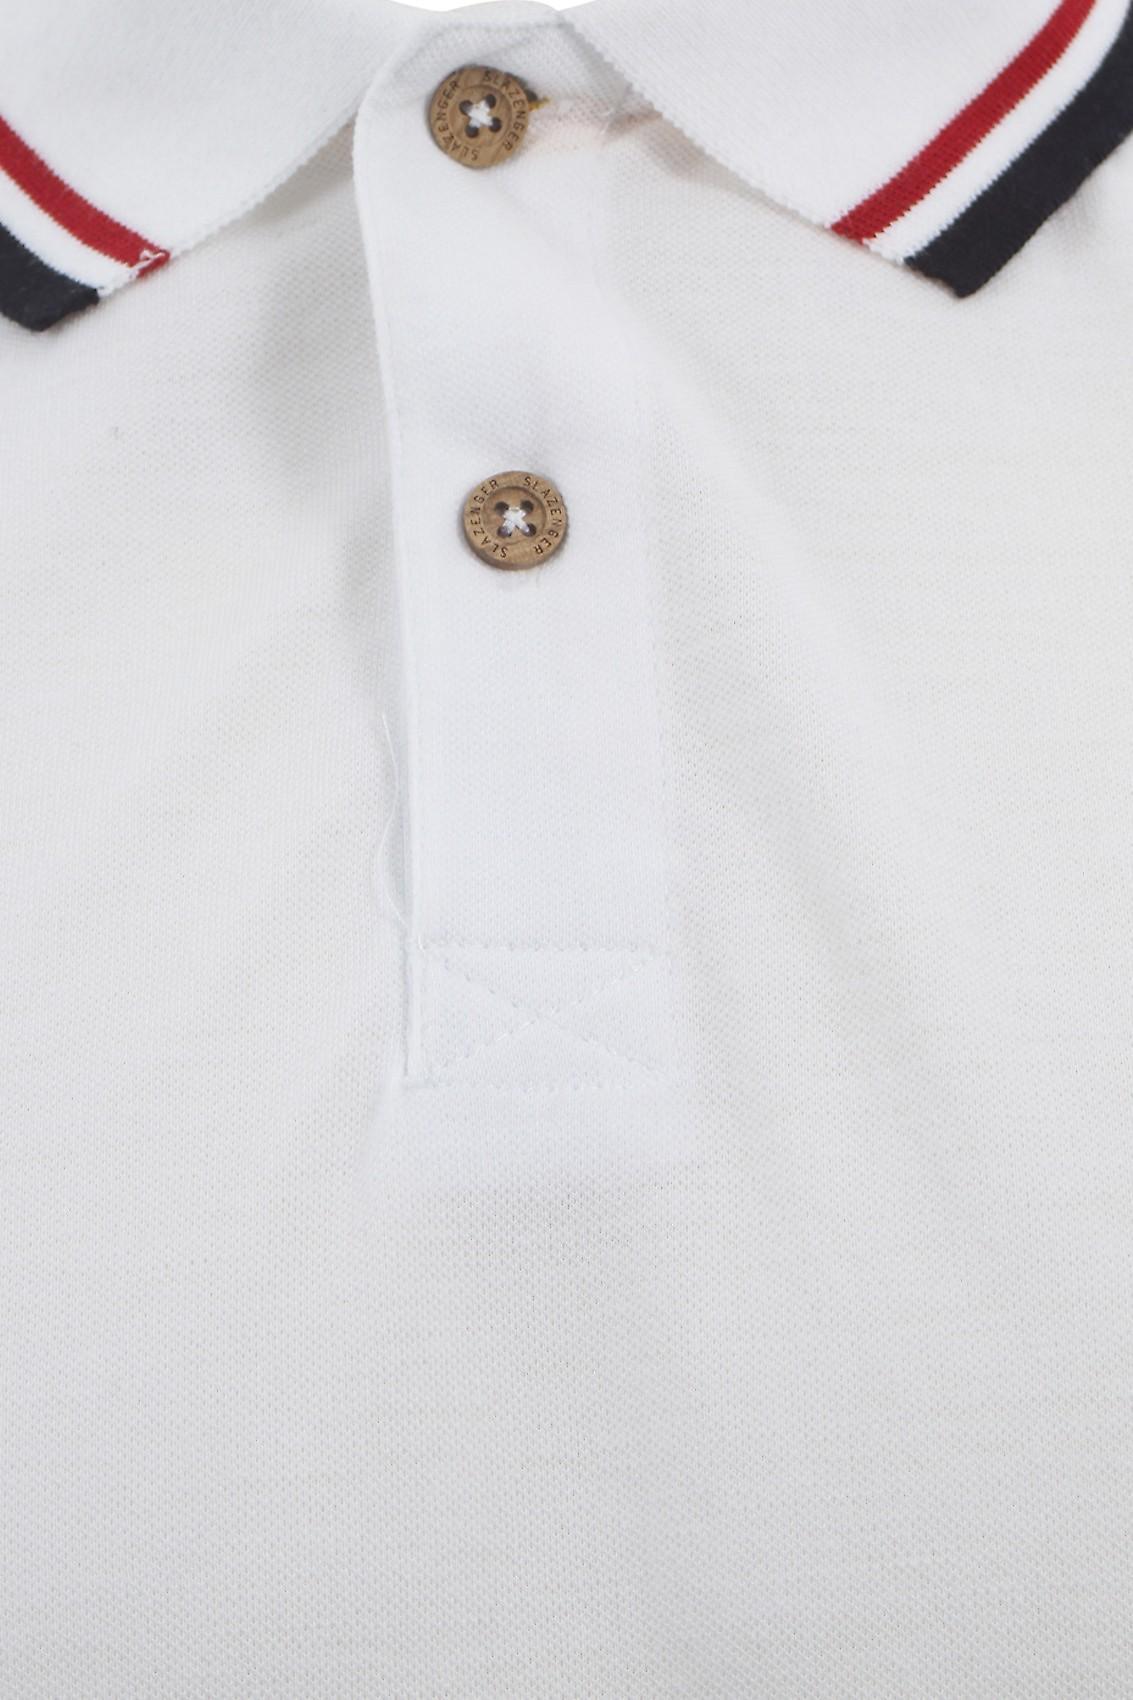 White Slazenger Vintage Polo Shirt With Striped Collar